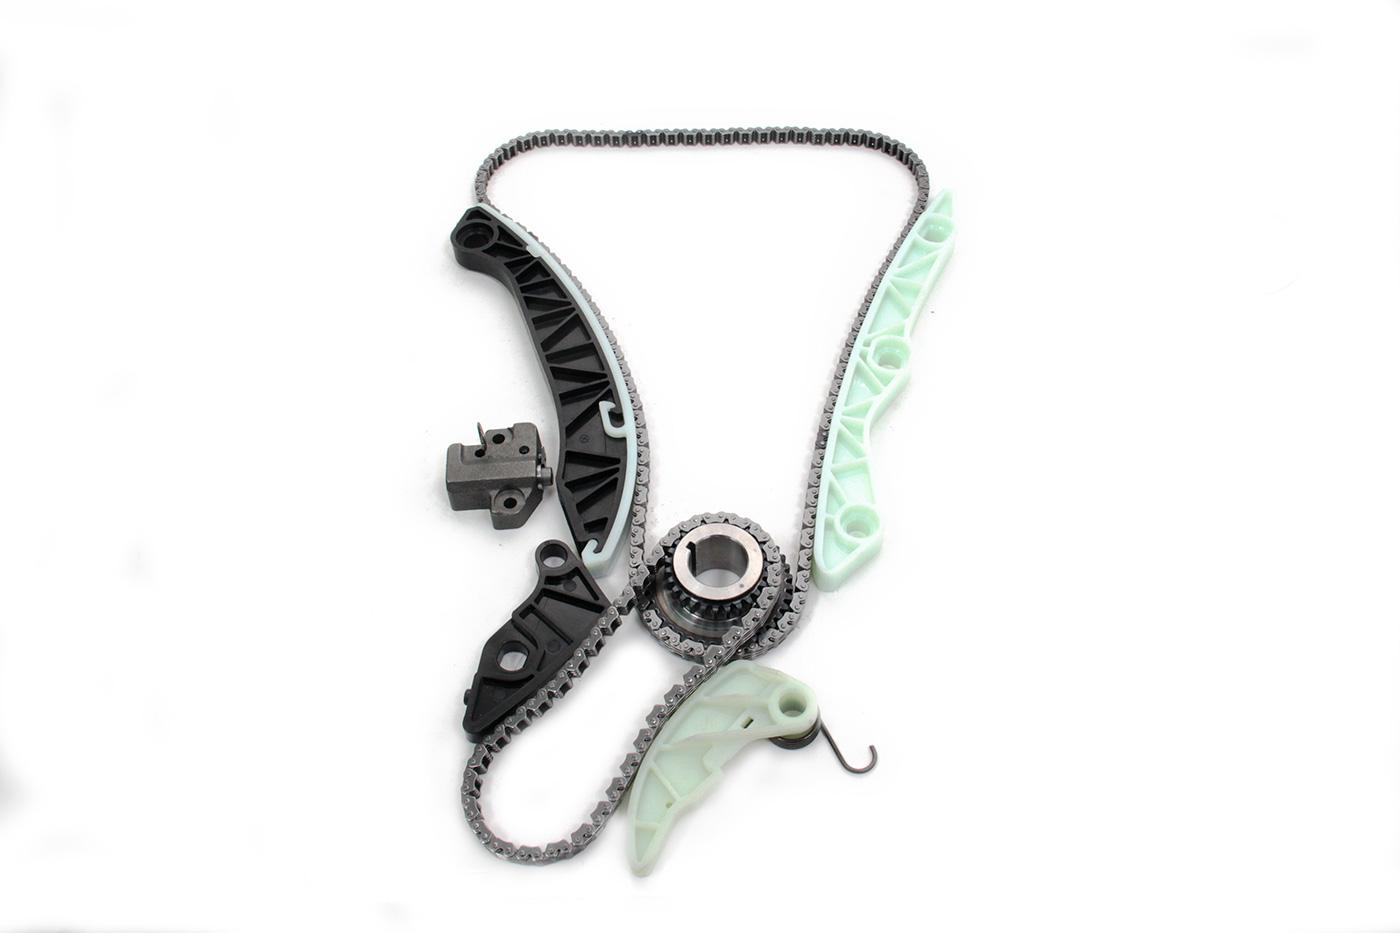 Timing Chain Kit Dodge Caliber 1.8Lts EBA 4Cyl 07-09